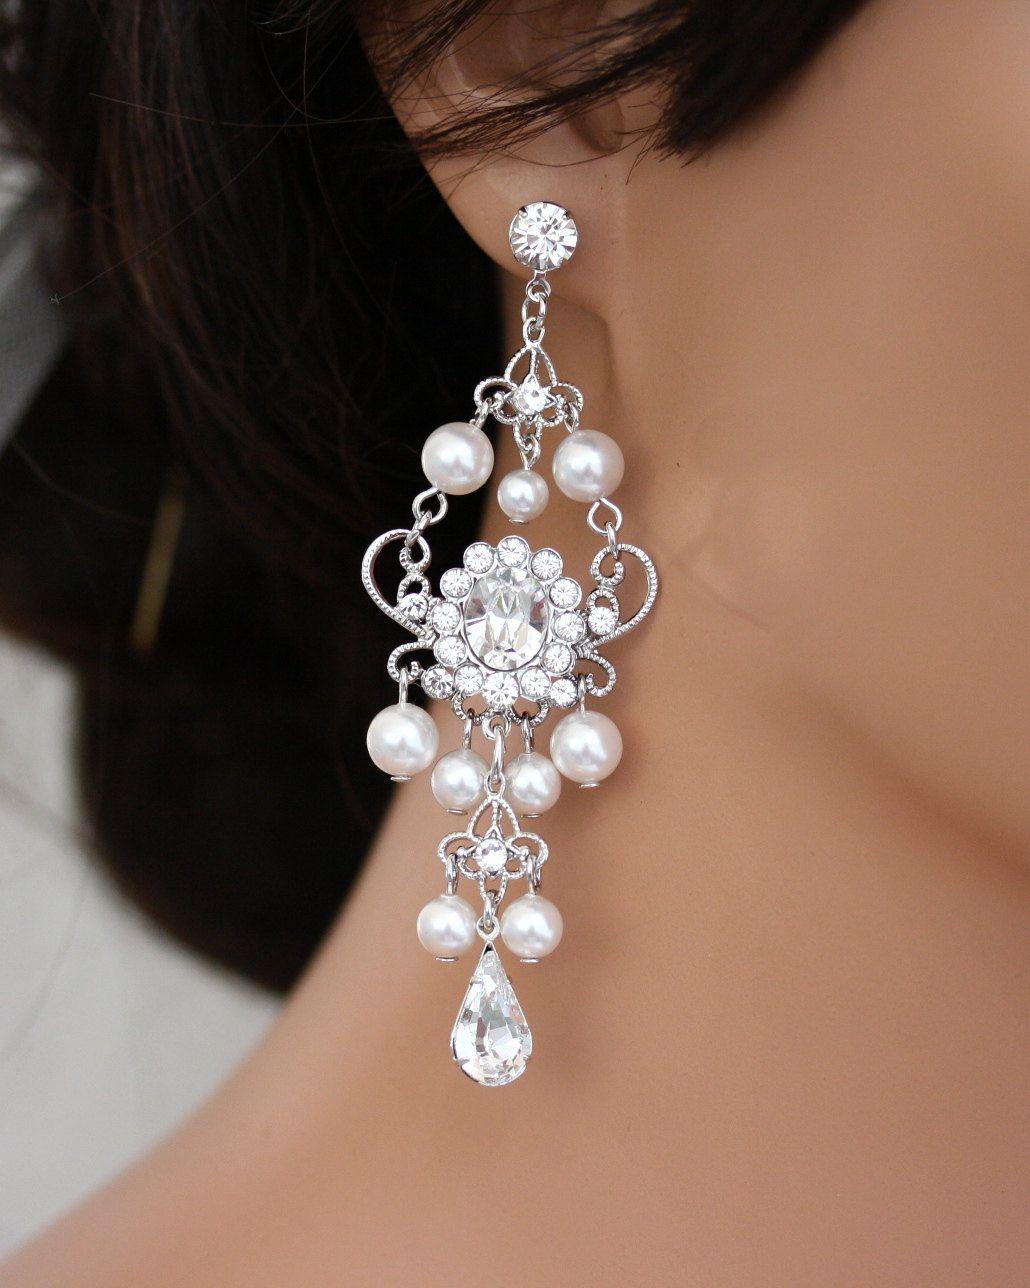 Chandelier wedding earrings ivory pearl rhinestone bridal earrings chandelier wedding earrings ivory pearl rhinestone bridal earrings dramatic chandelier earrings wedding jewelry milla arubaitofo Choice Image